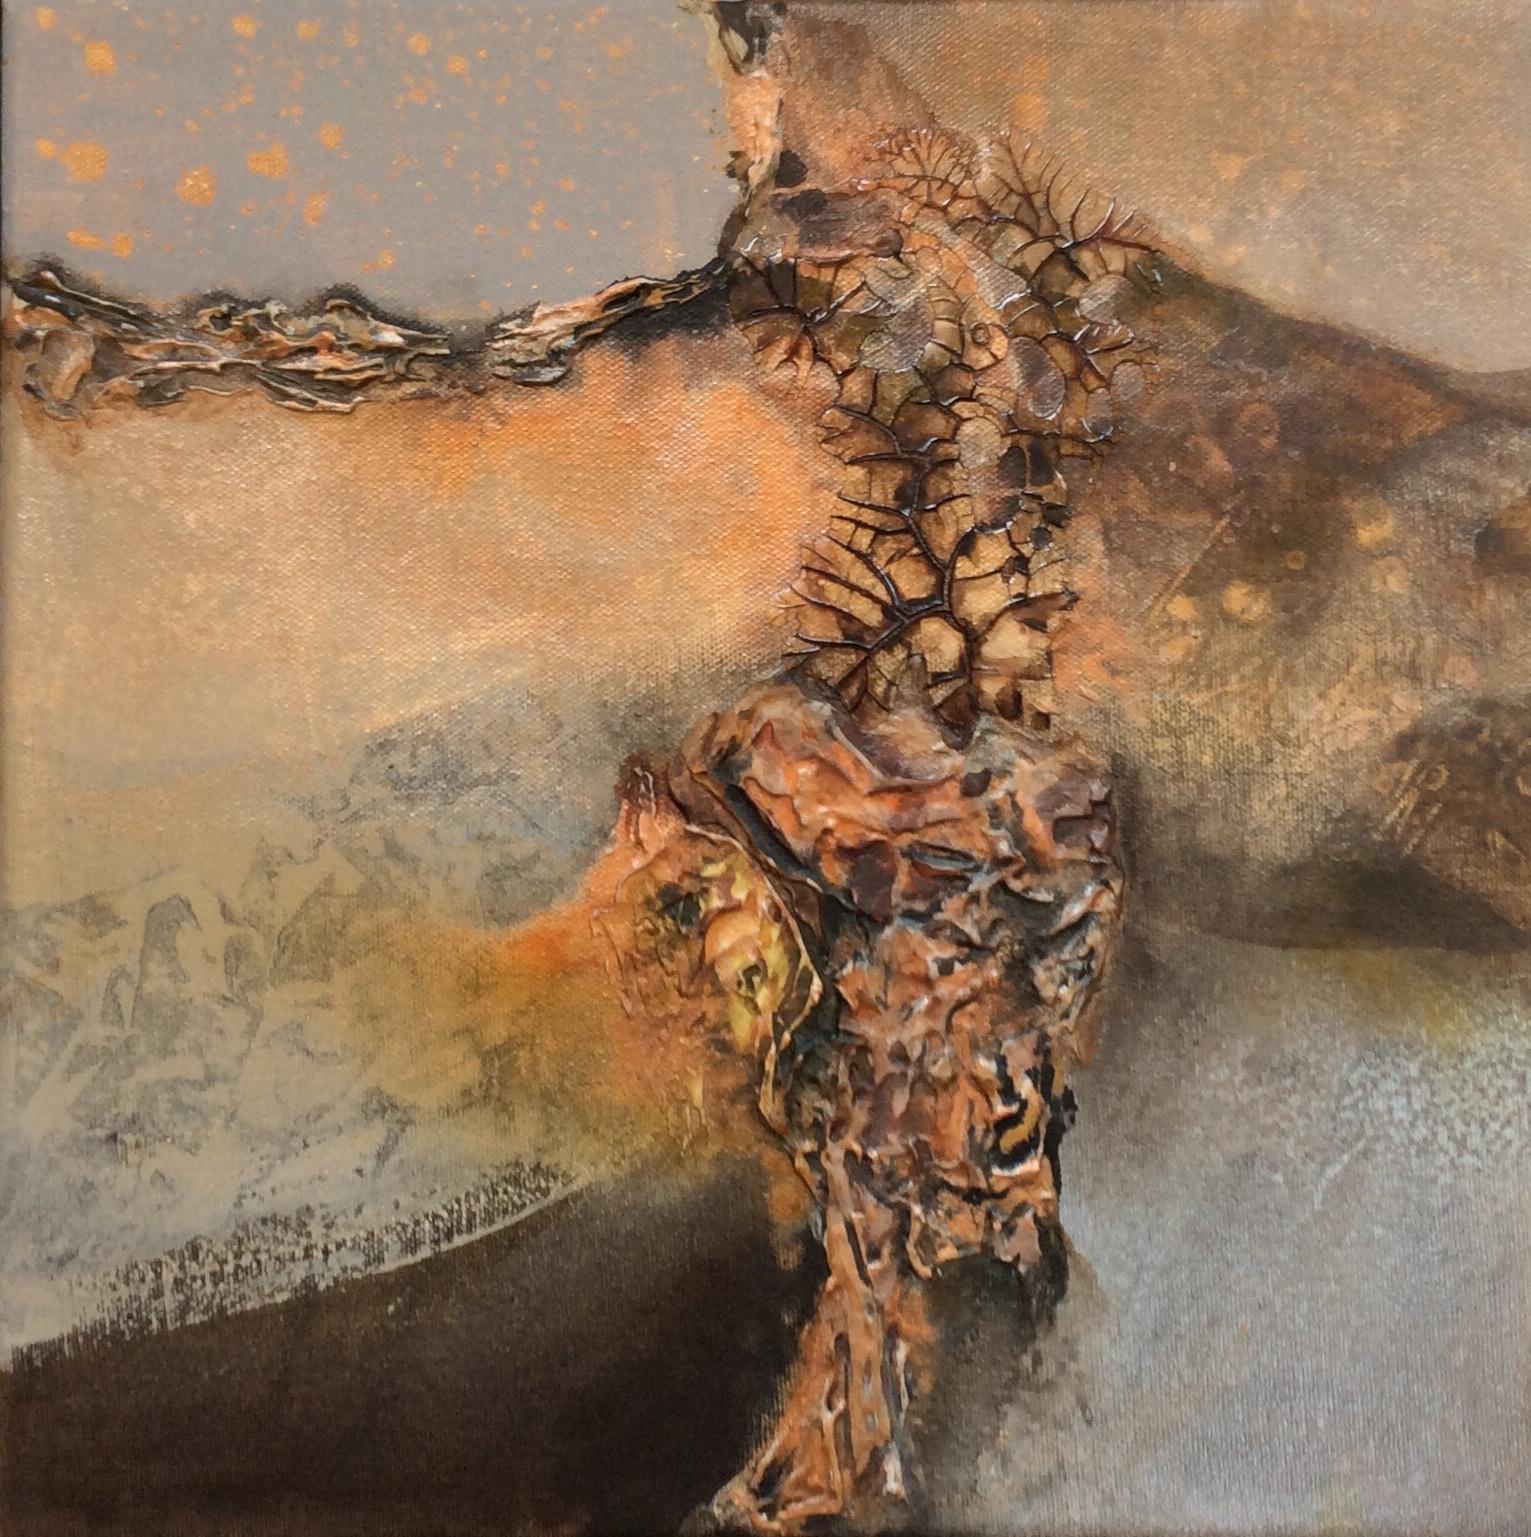 Mixed media on 12 x 12 canvas. SOLD by Jennifer Stone at Jennifer Stone Artwork